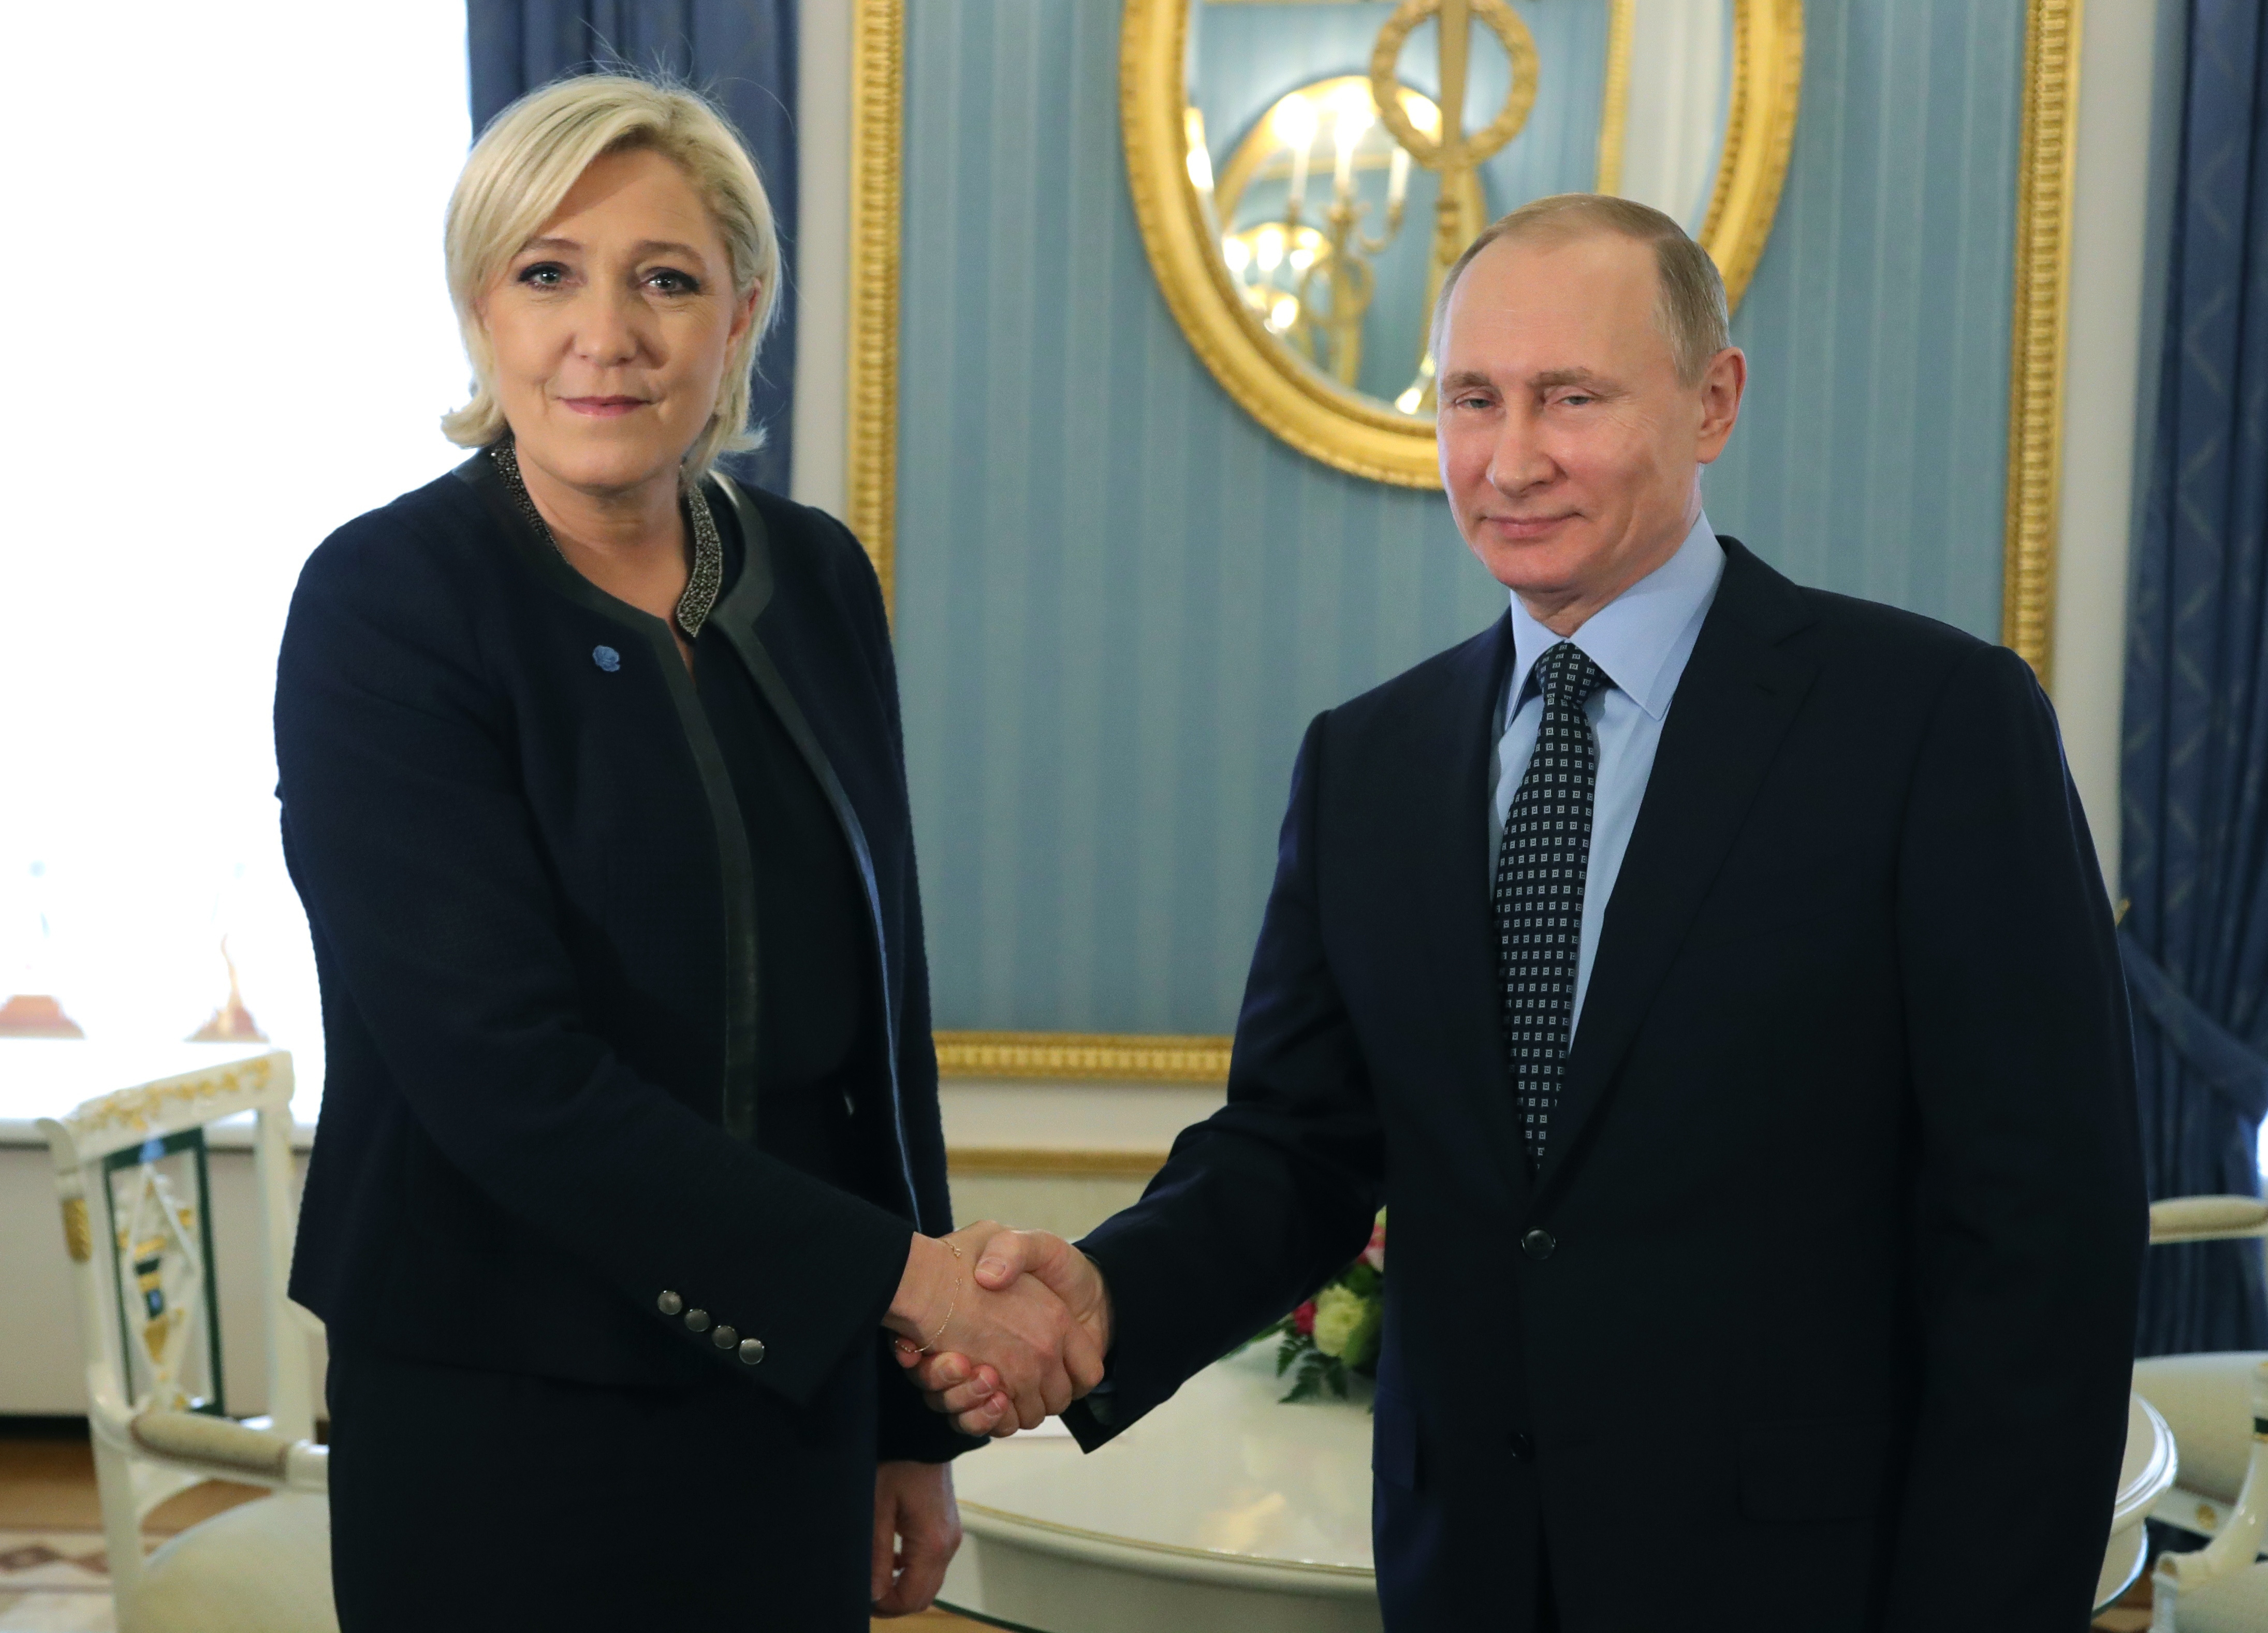 Le Penová, Putin